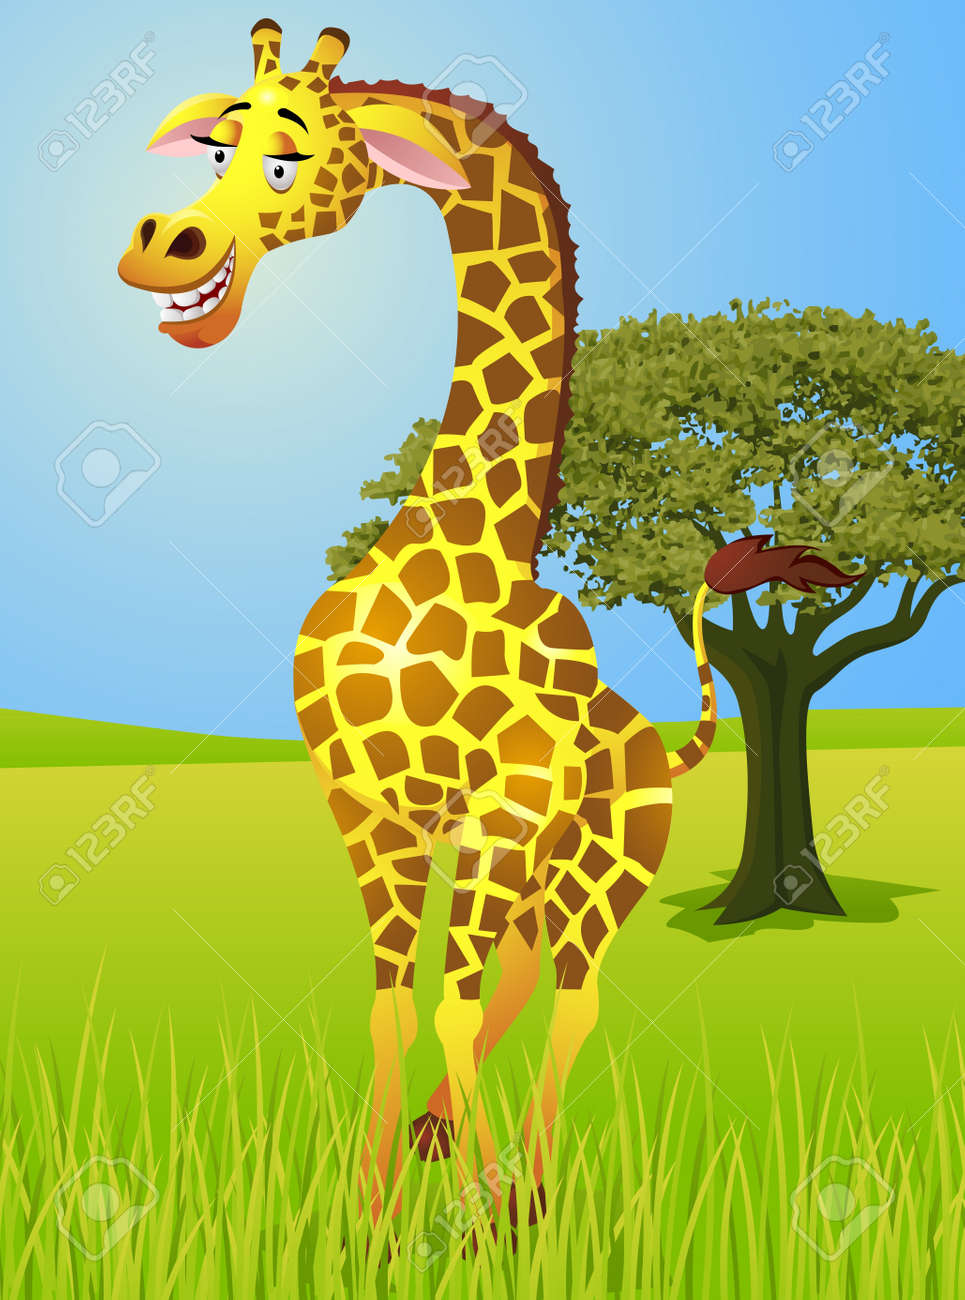 Jungle Clipart : jungle, clipart, Giraffe, Jungle, Royalty, Cliparts,, Vectors,, Stock, Illustration., Image, 13446495.